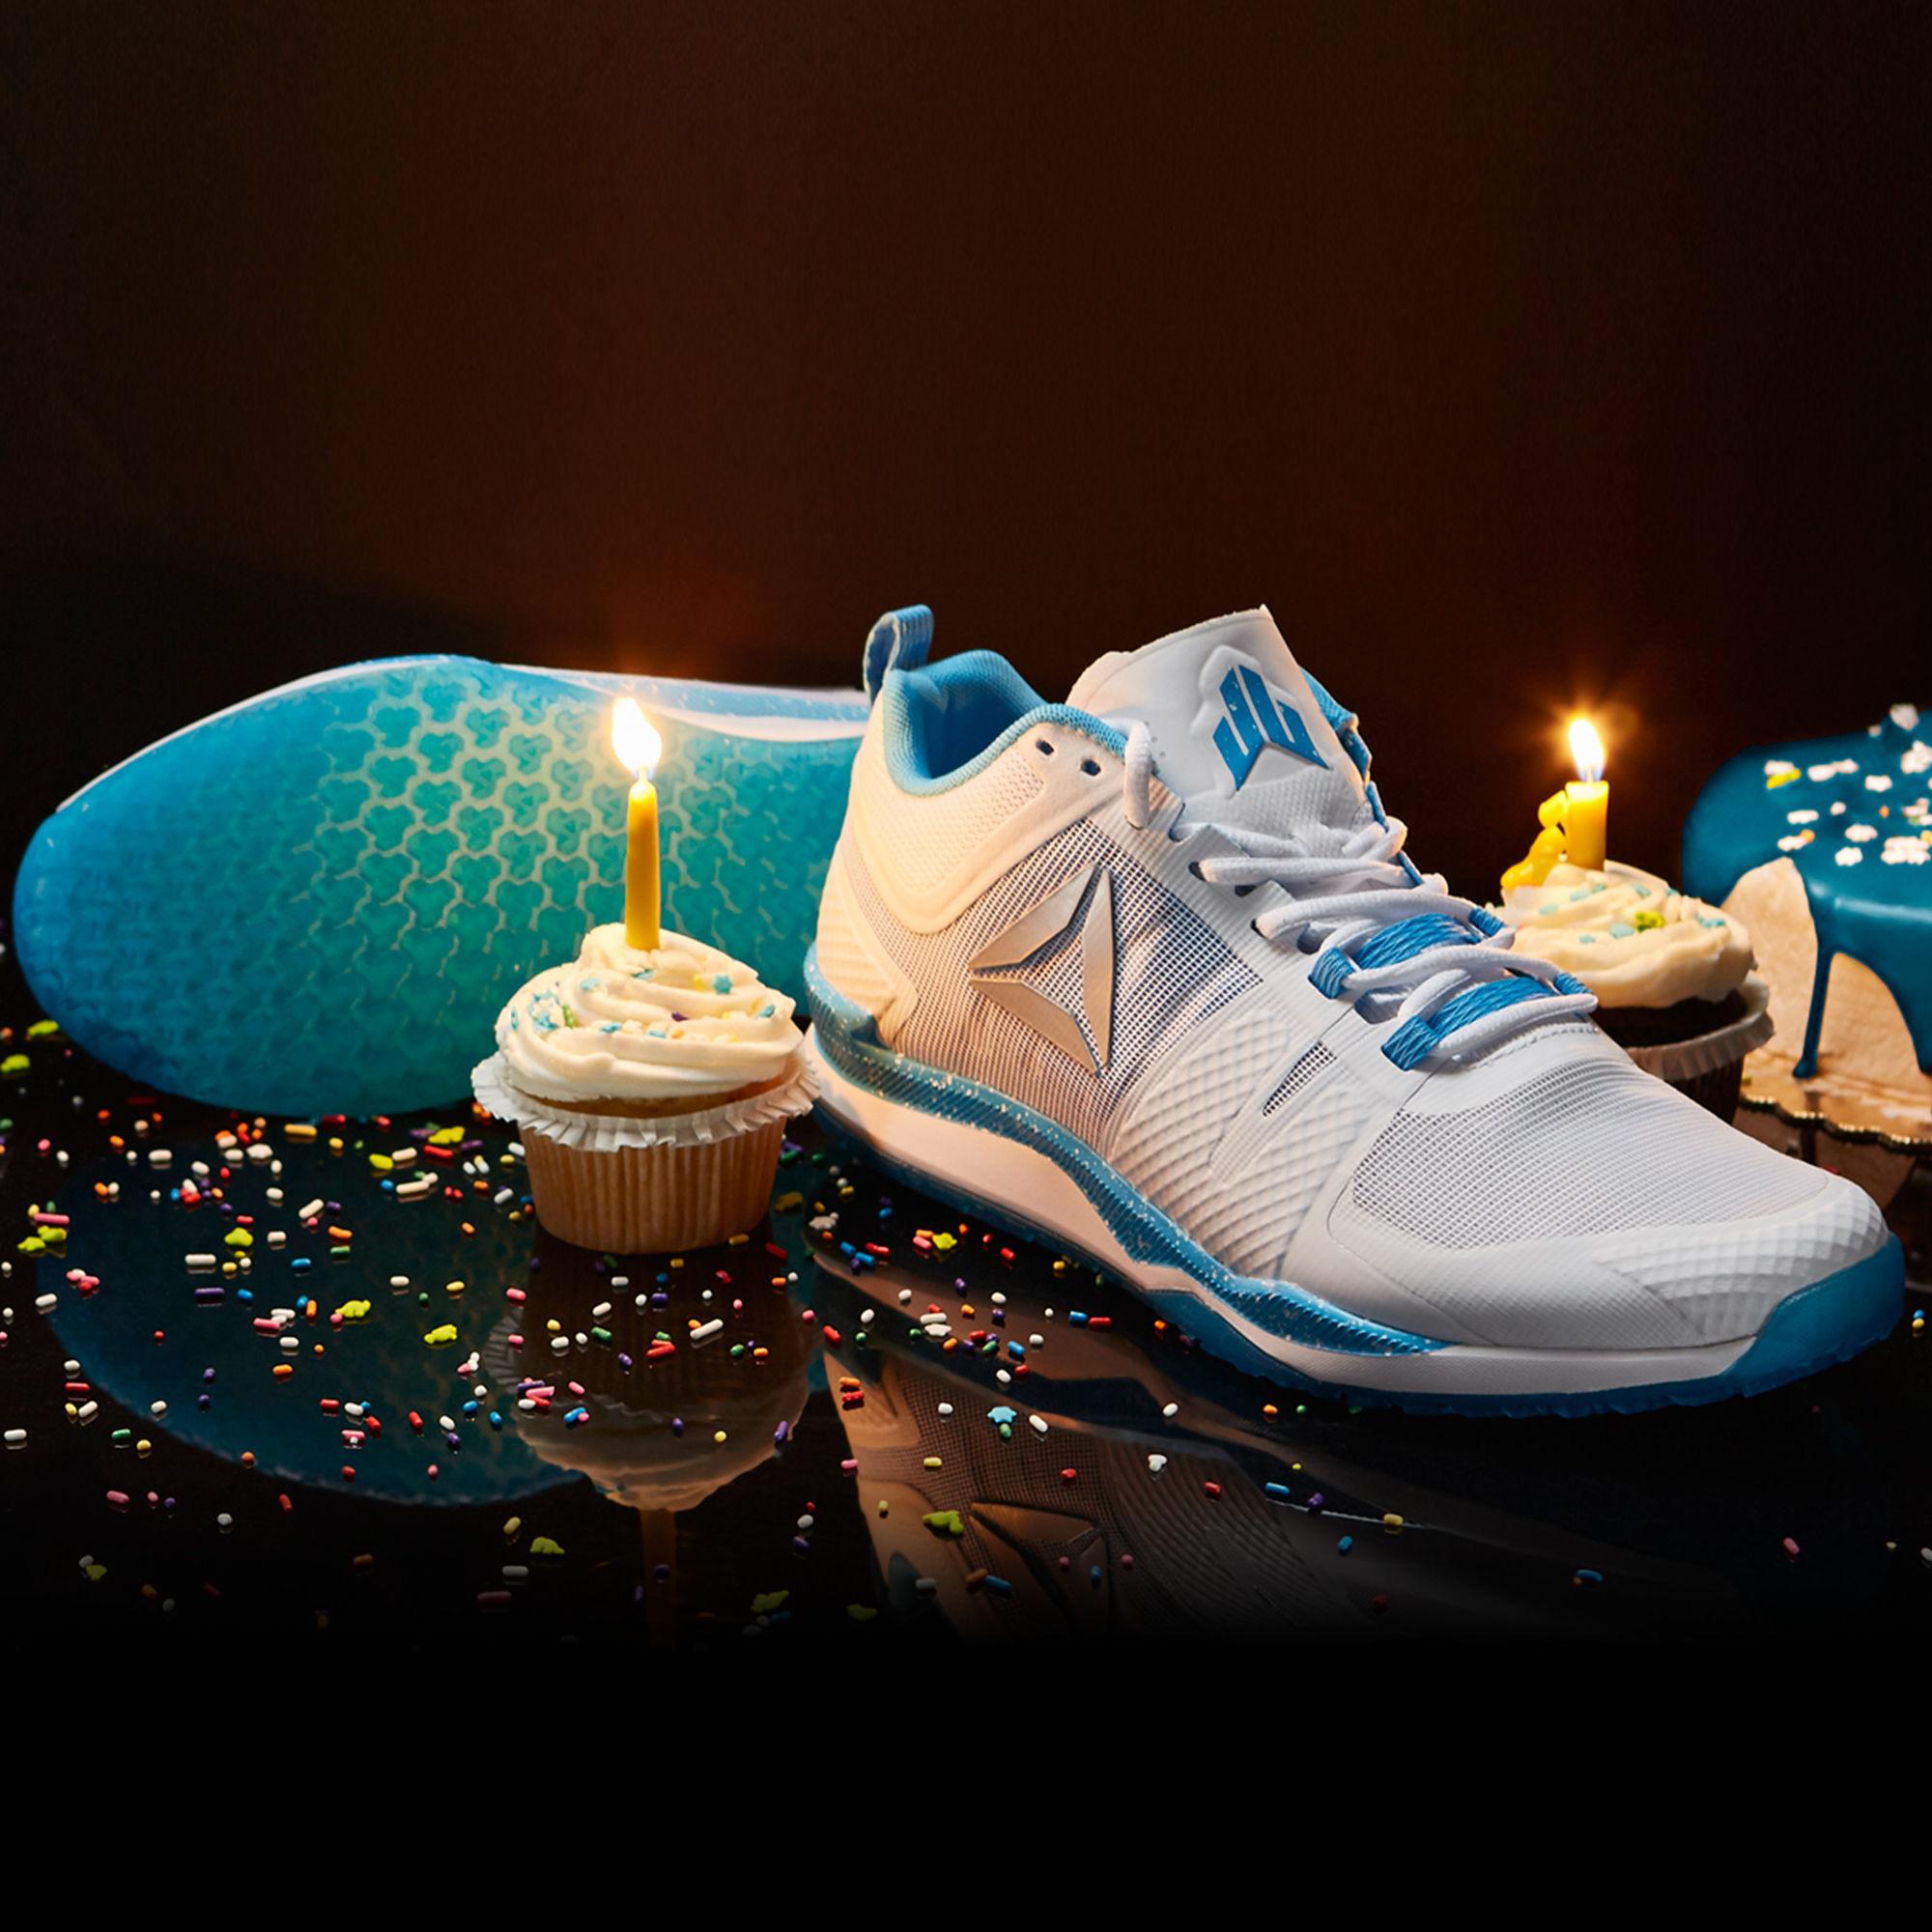 Reebok JJ1 Icing On The Cake Training Shoe $44.99 + Free S/H